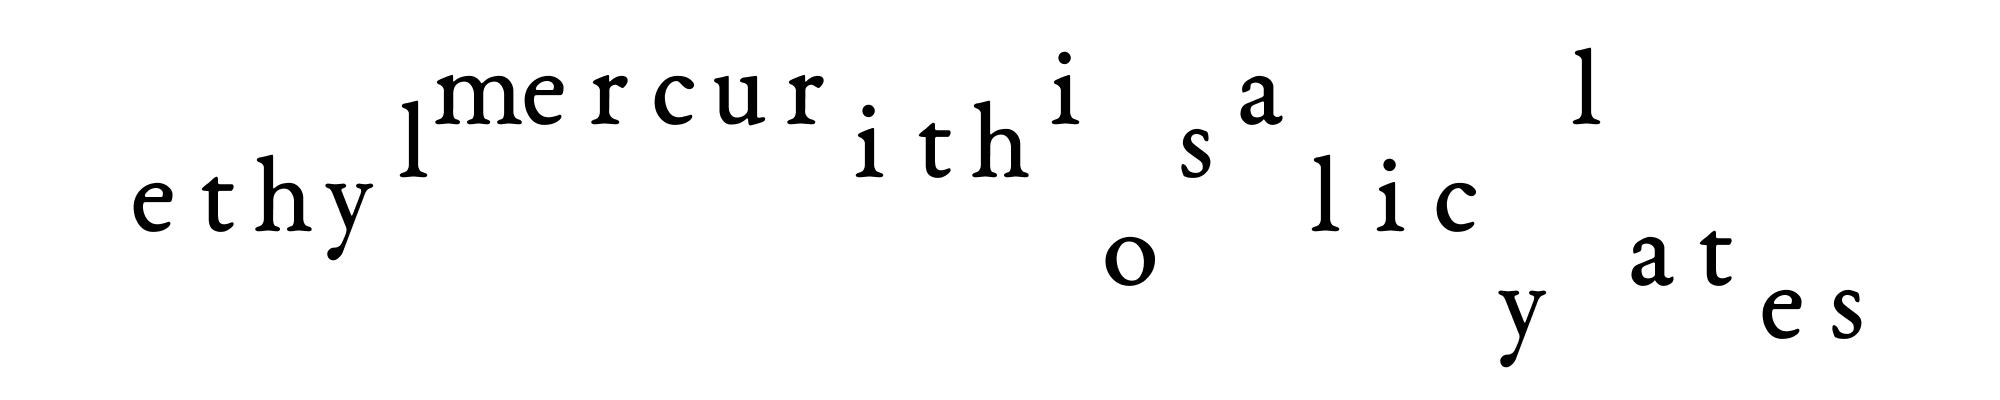 ethylmercurithiosalicylates mercurial ethylic liths oat yes